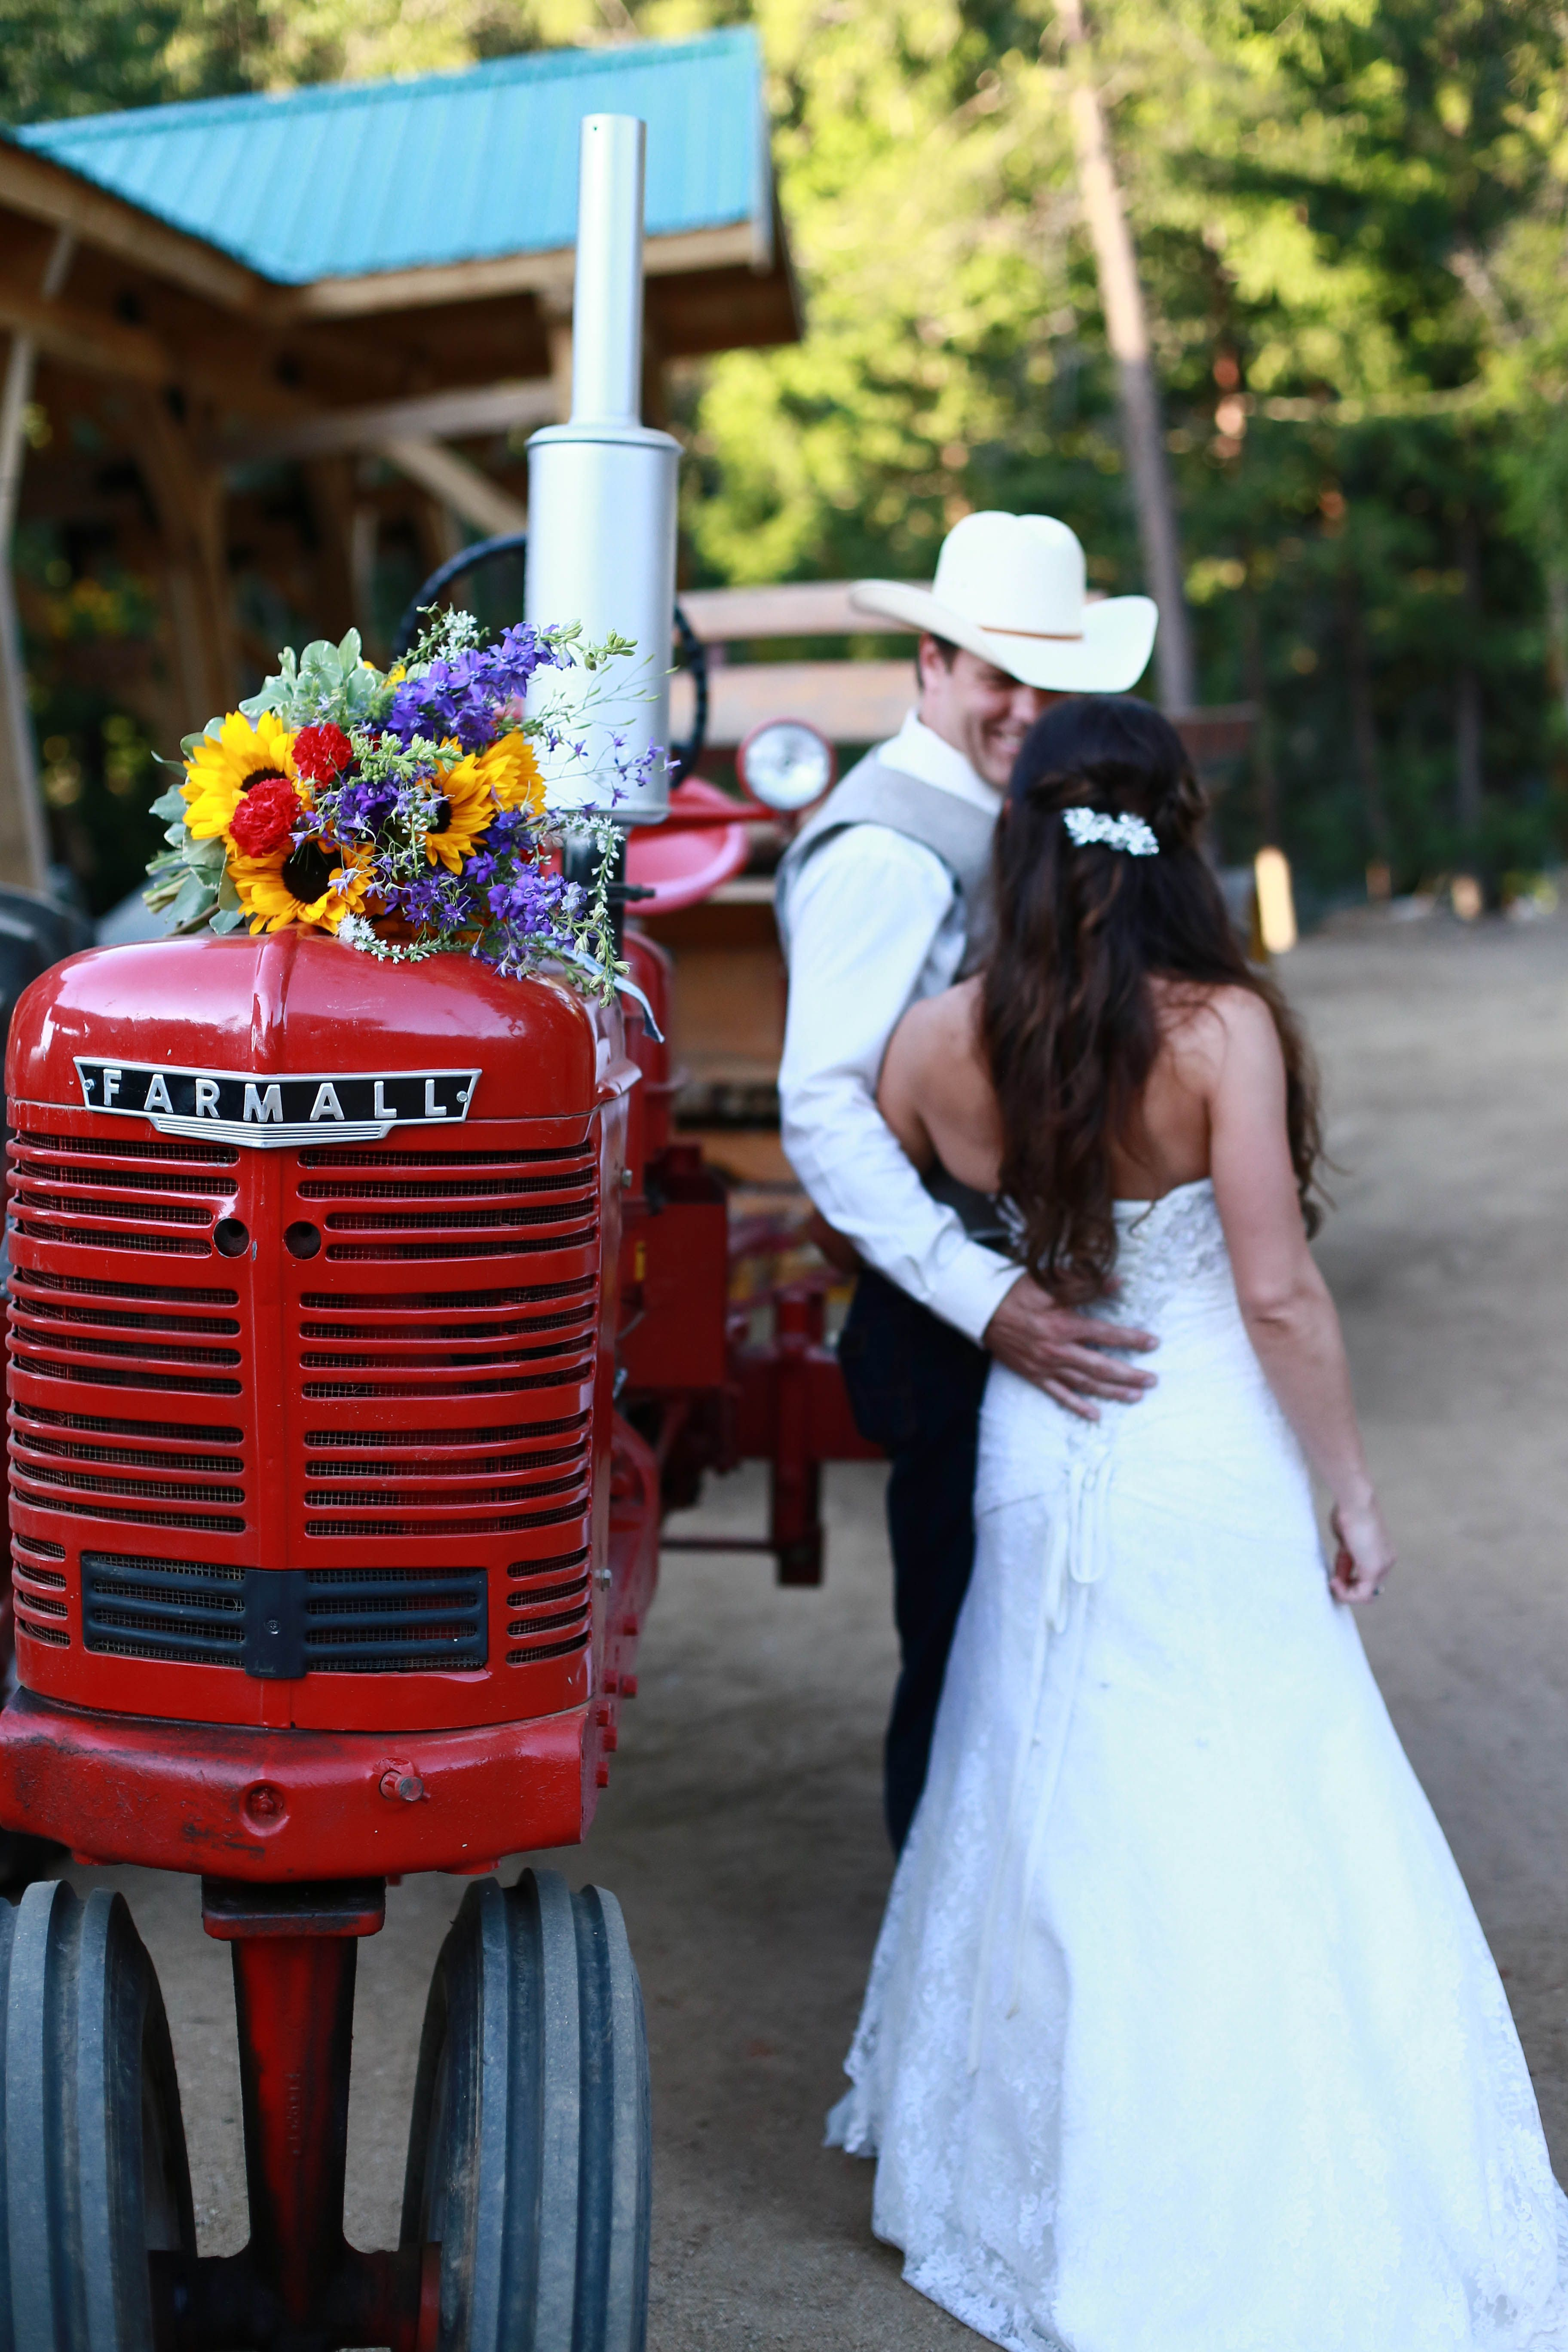 Pin By Saluti Cellars On Western Wedding At Saluti Cellars Romantic Wedding Ceremony Country Chic Wedding Western Wedding